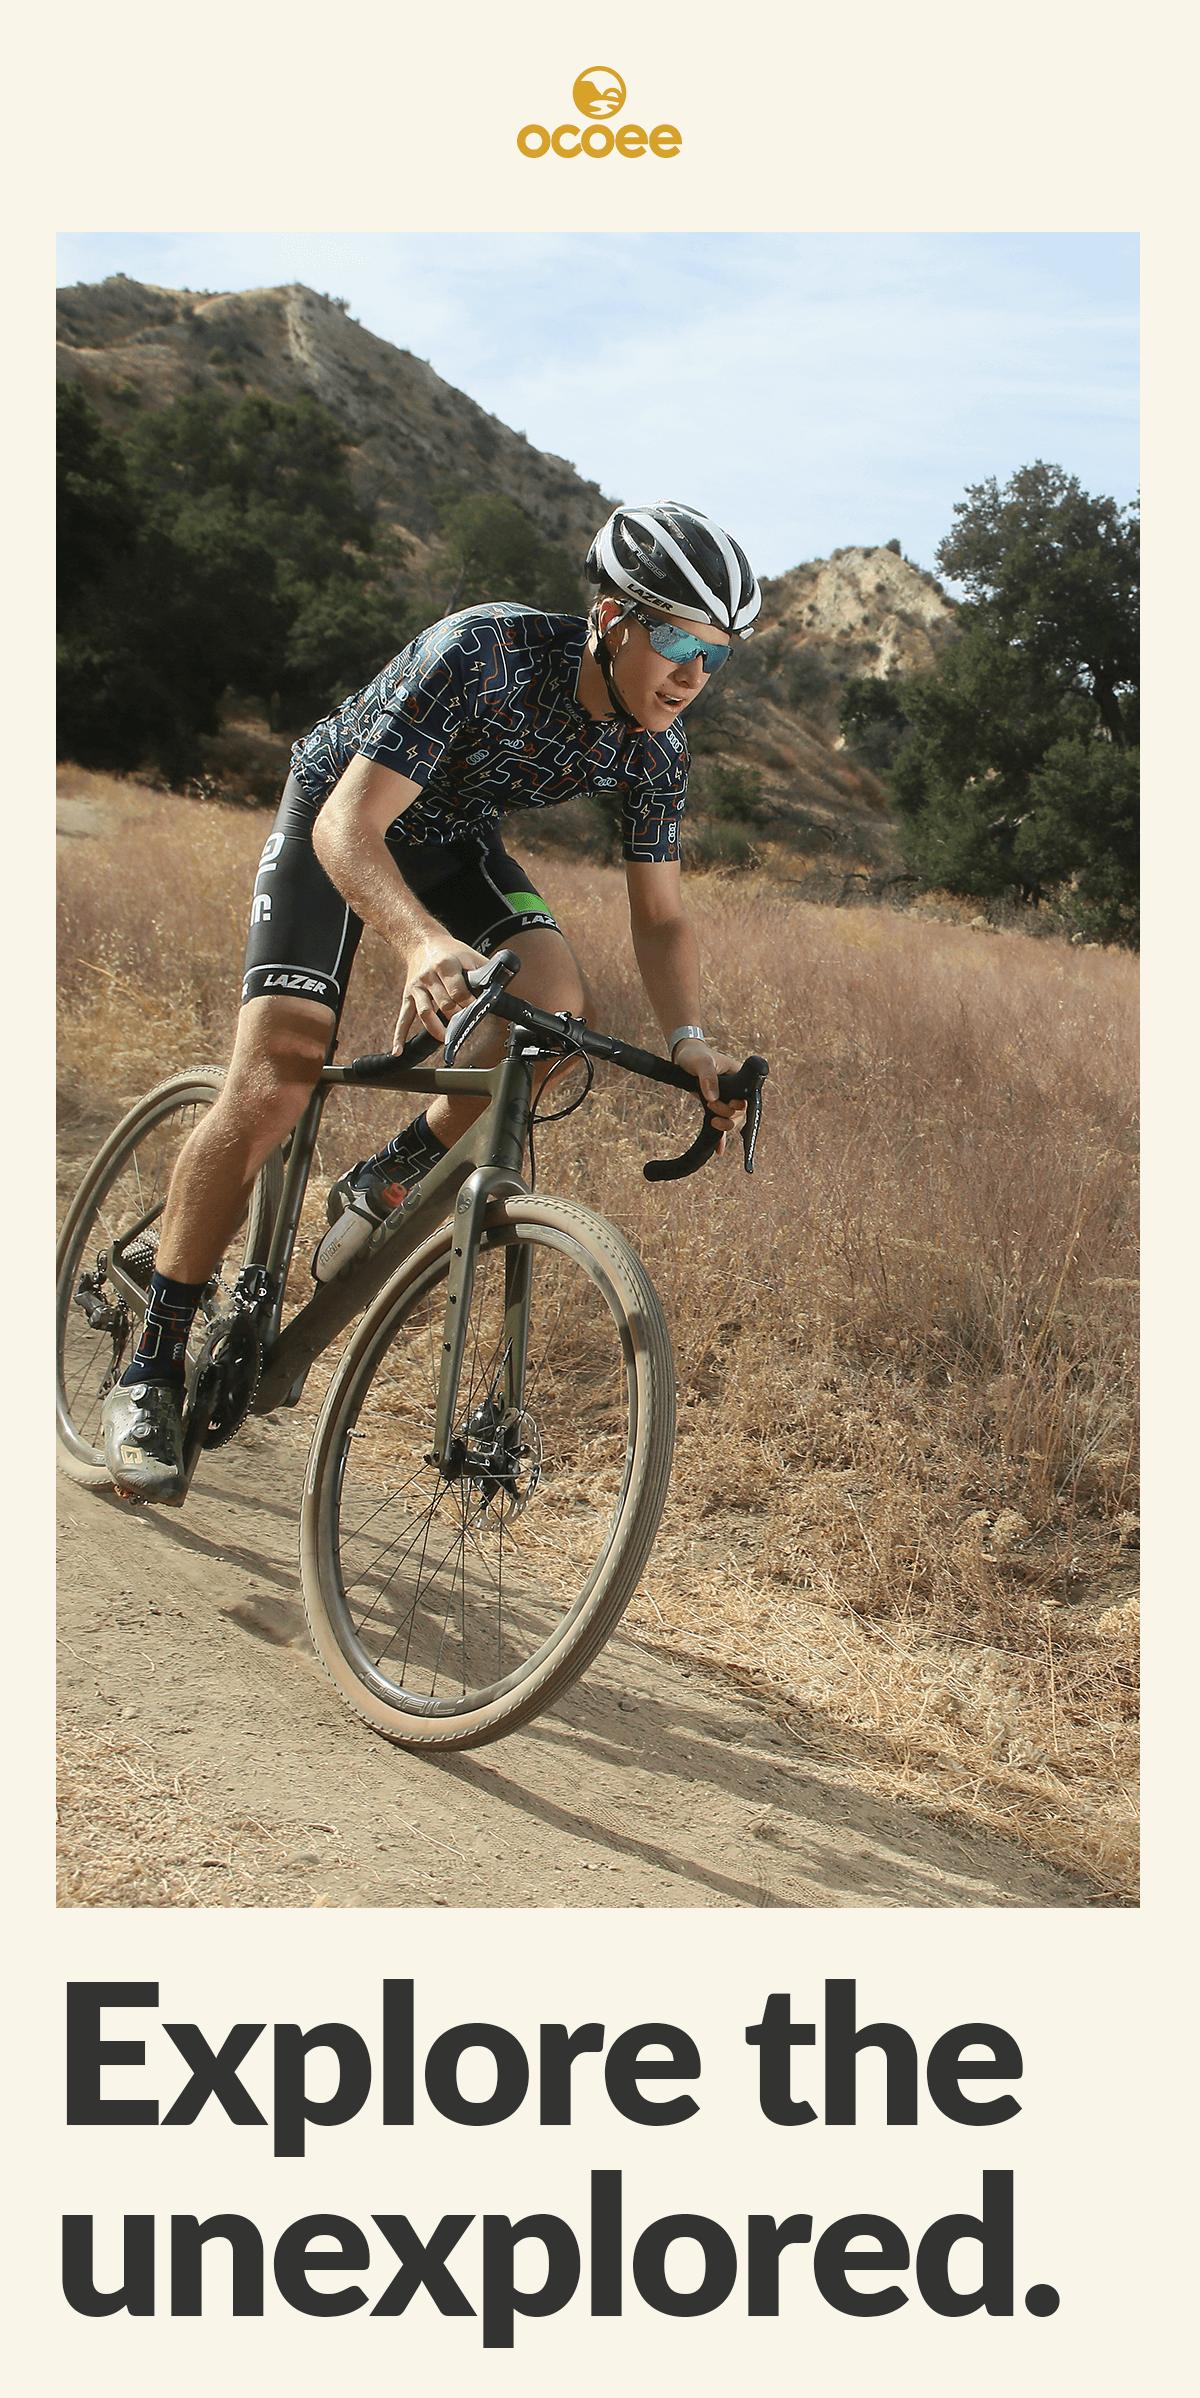 Explore the unexplored with the Ocoee Boundary gravel bike.